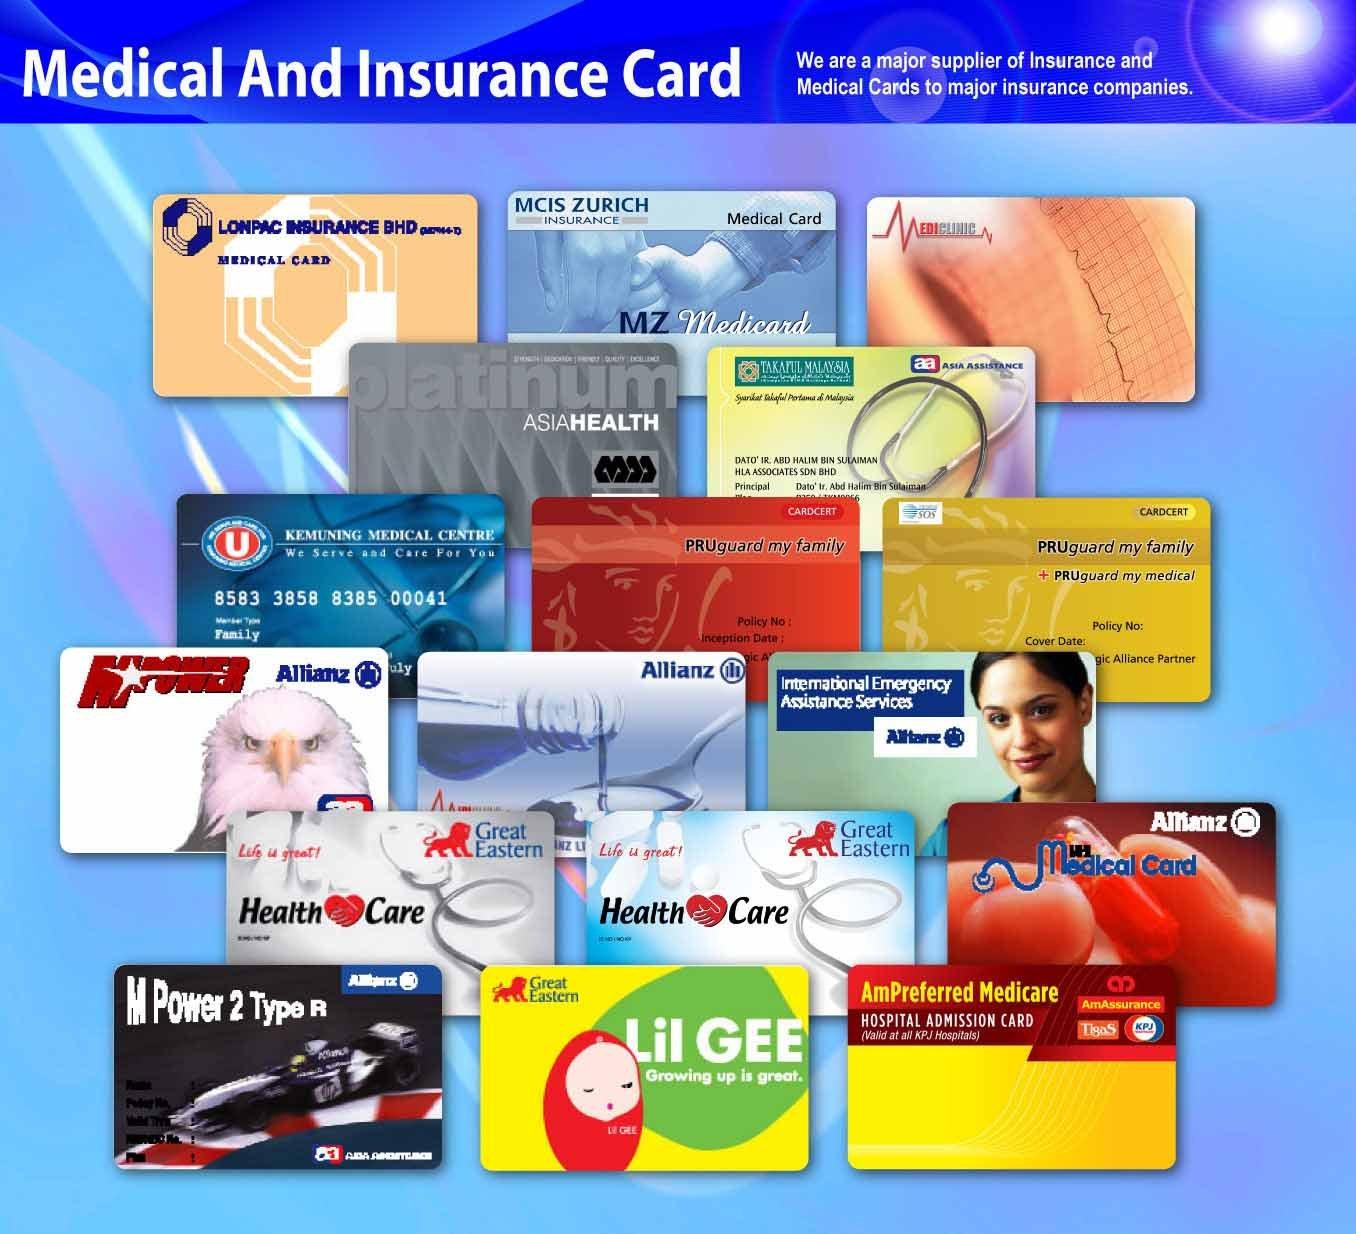 Medical Insurance: Medical Insurance Card